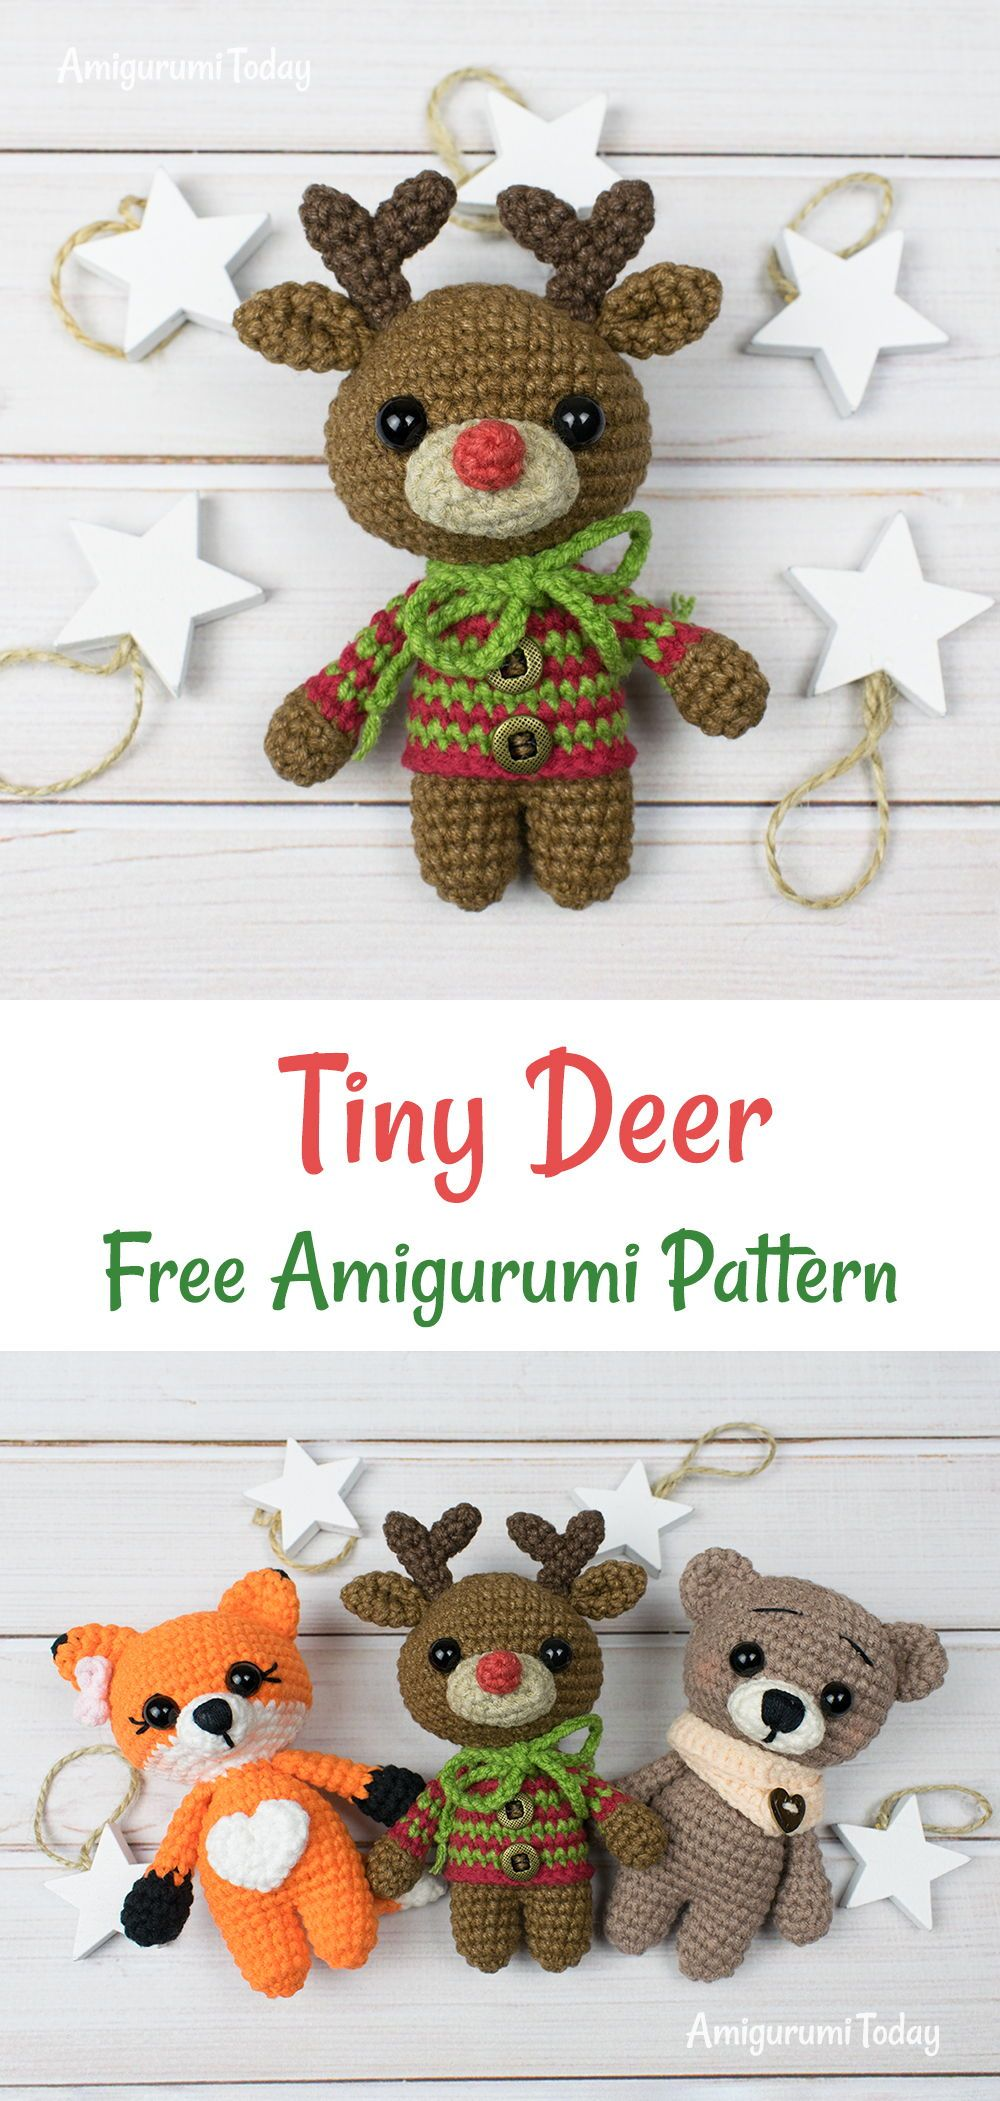 Christmas gingerbread man crochet pattern - Amigurumi Today | 2101x1000